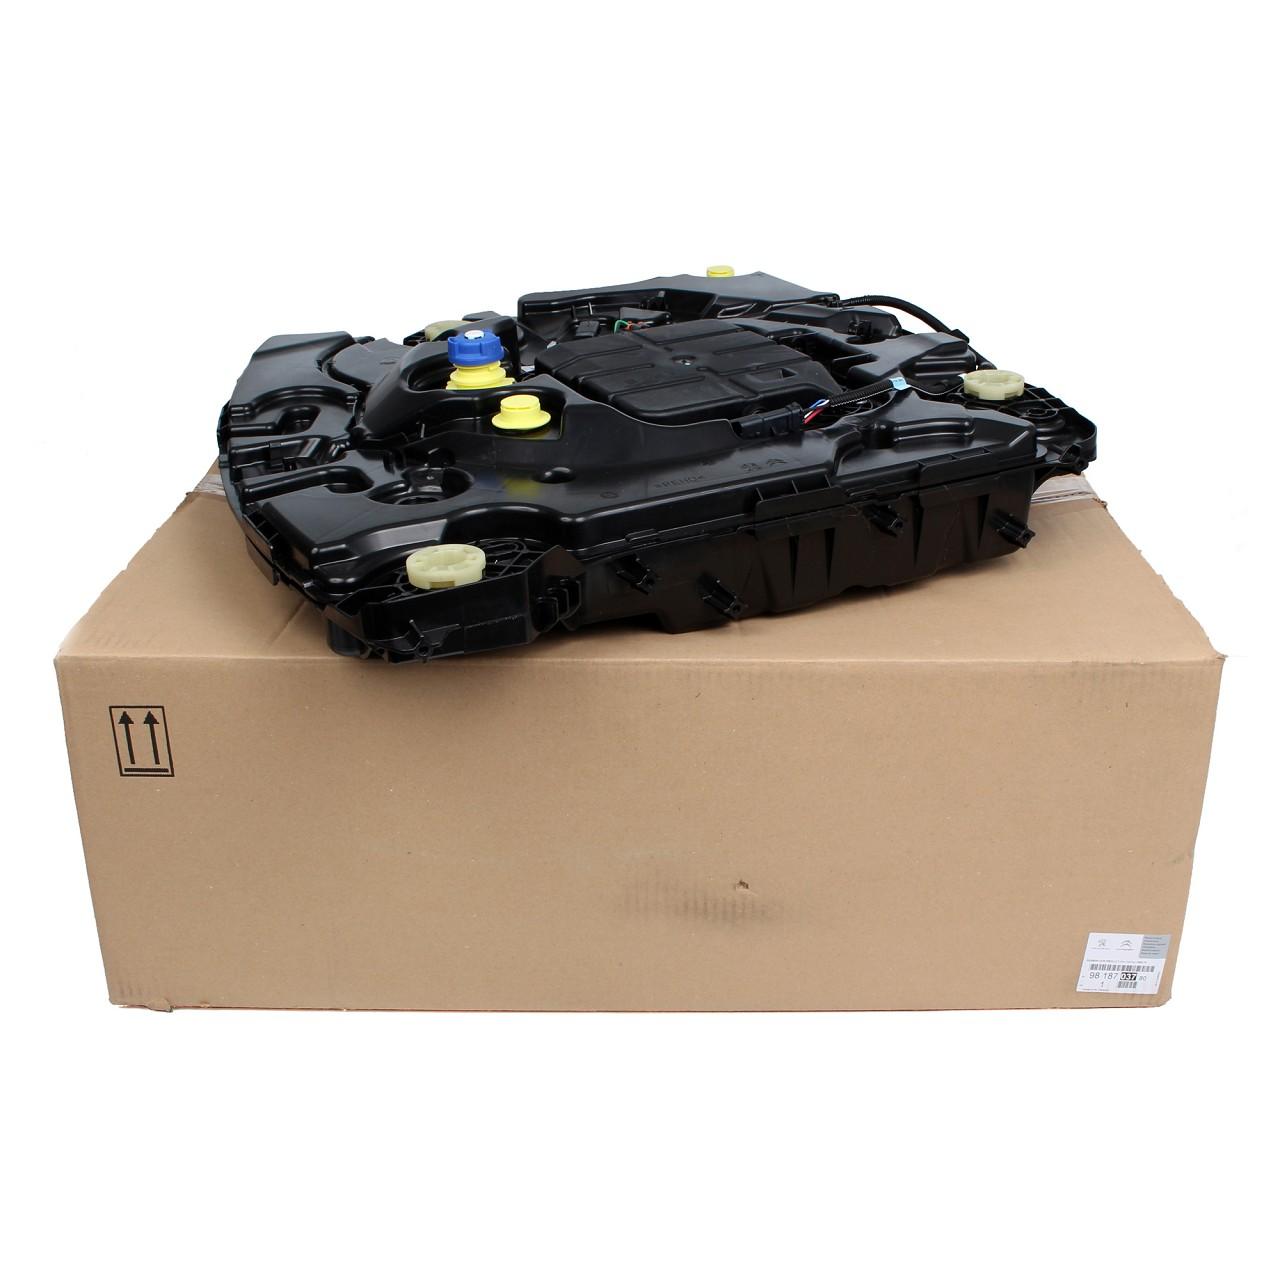 ORIGINAL Citroen Peugeot Tank Kraftstoffadditiv 208 2008 C3 C4 DS3 9818703780